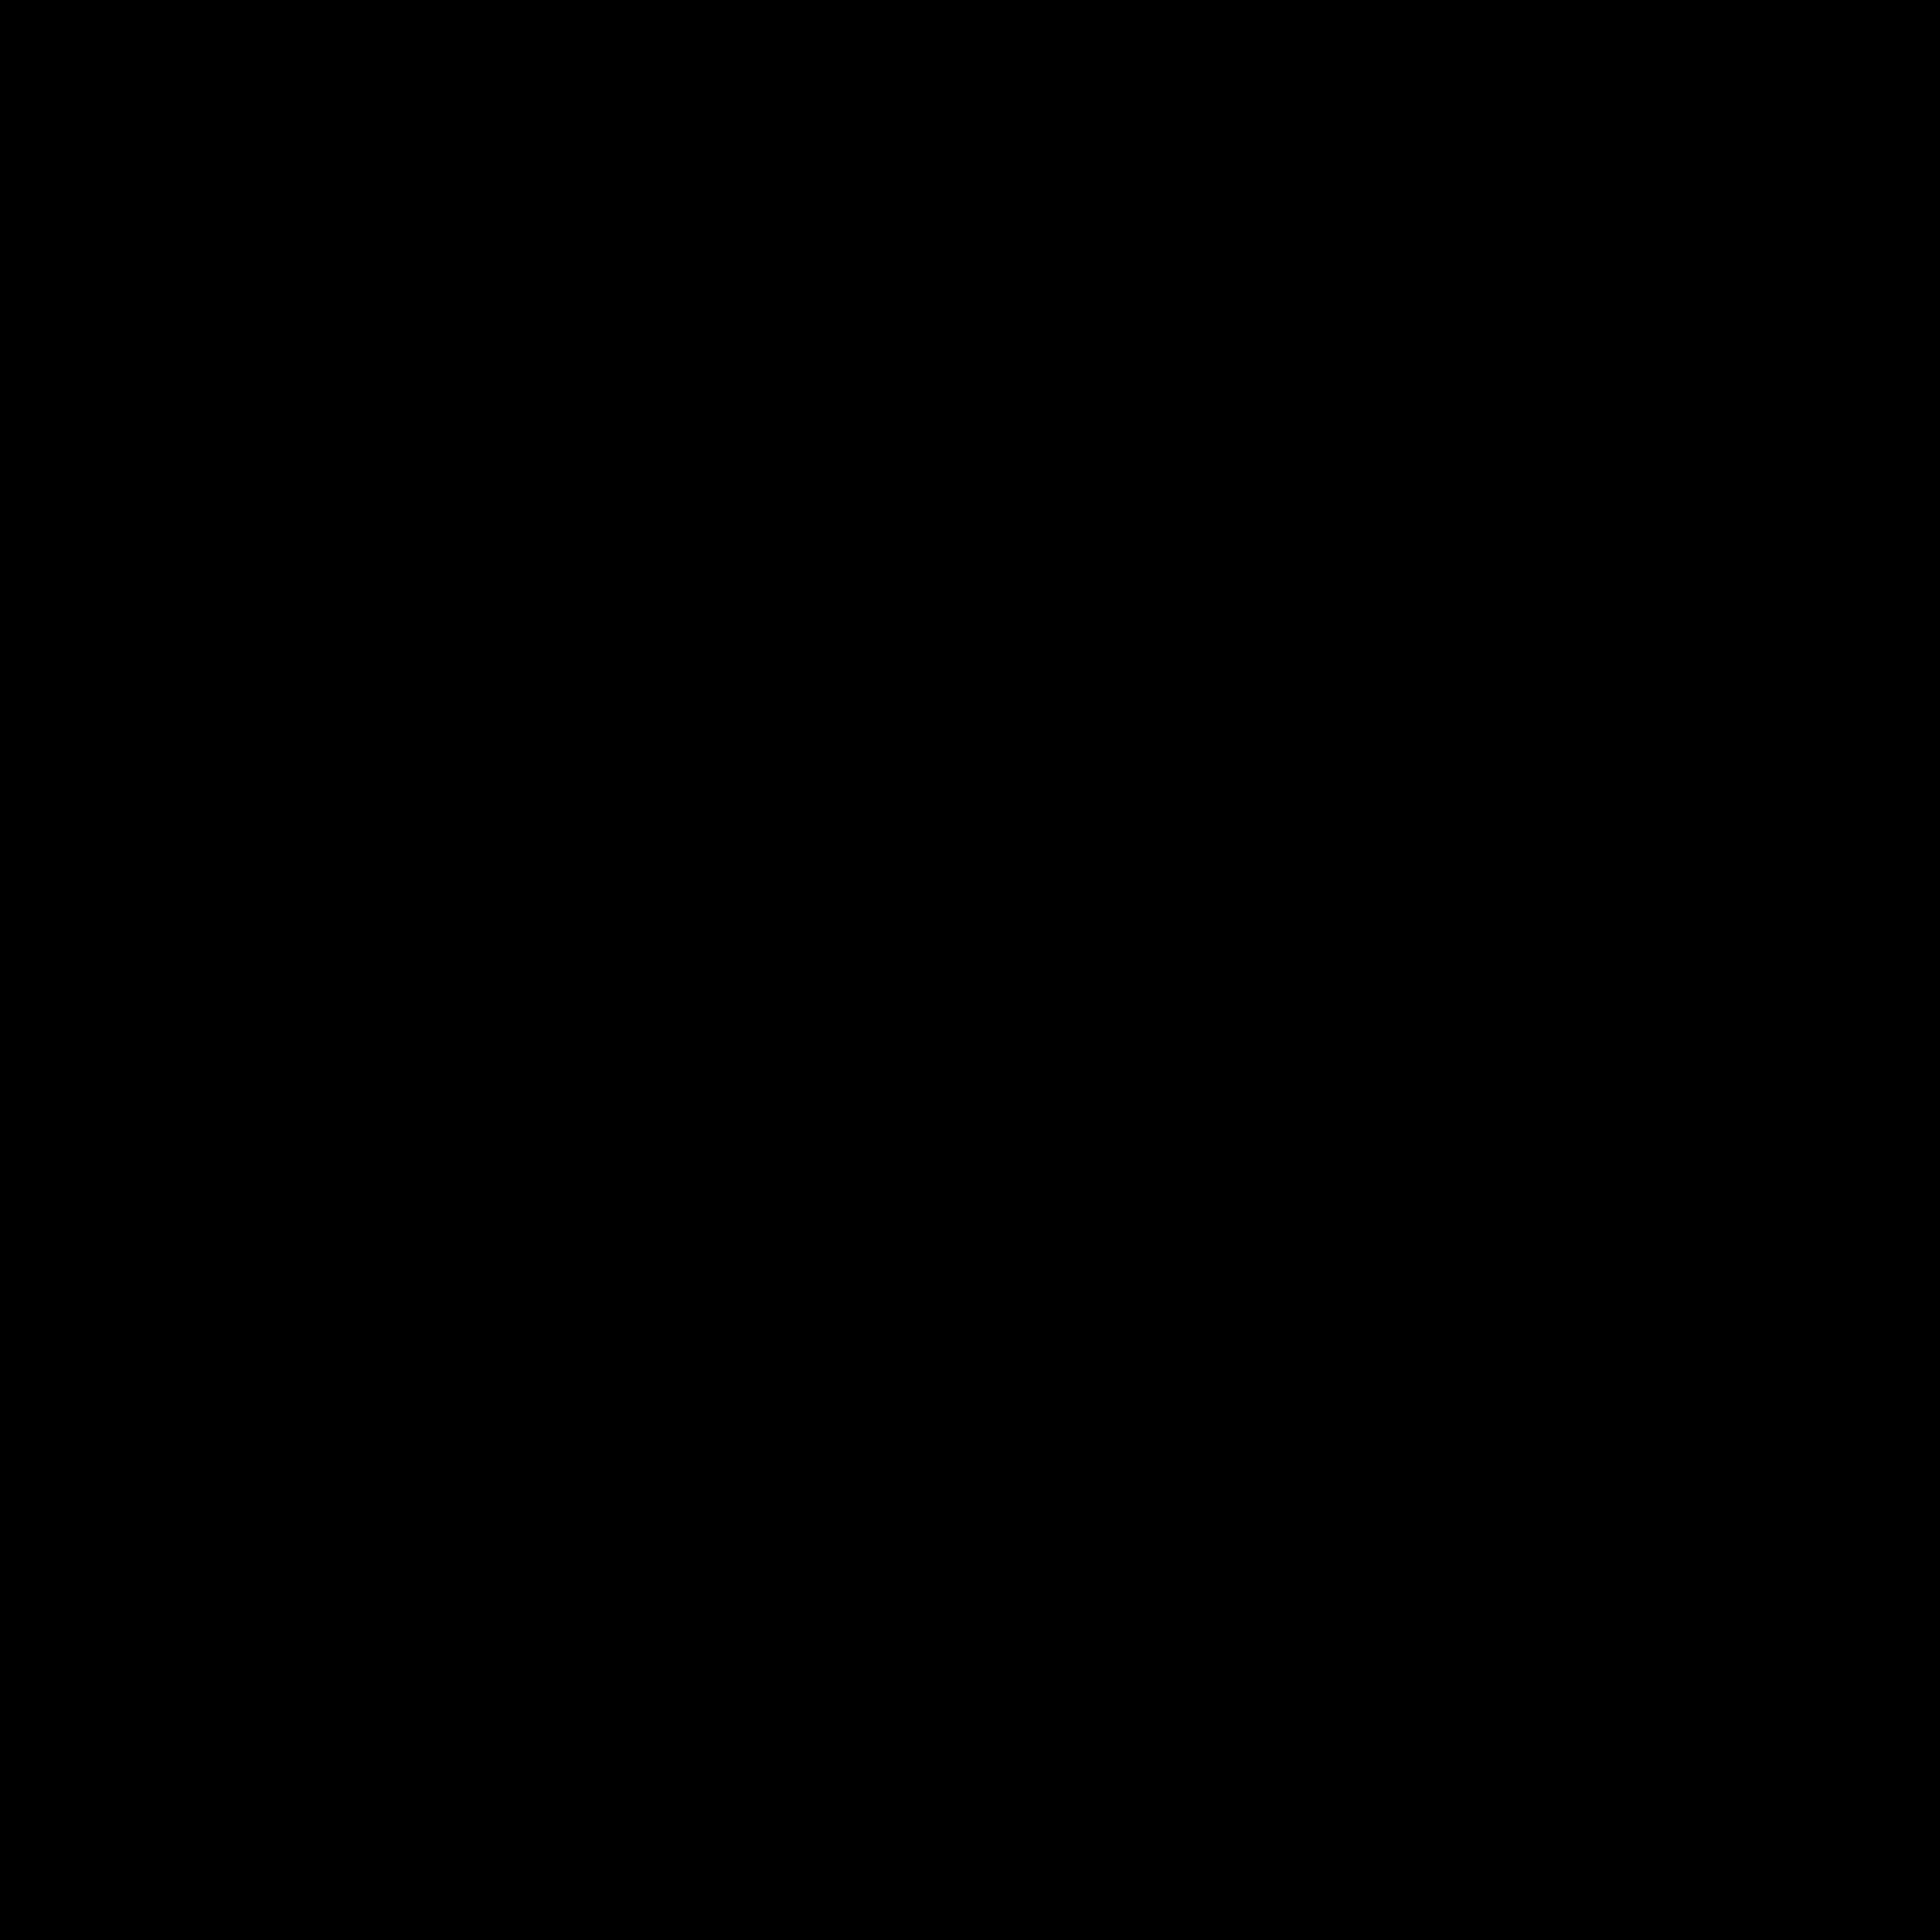 apple-icon-4